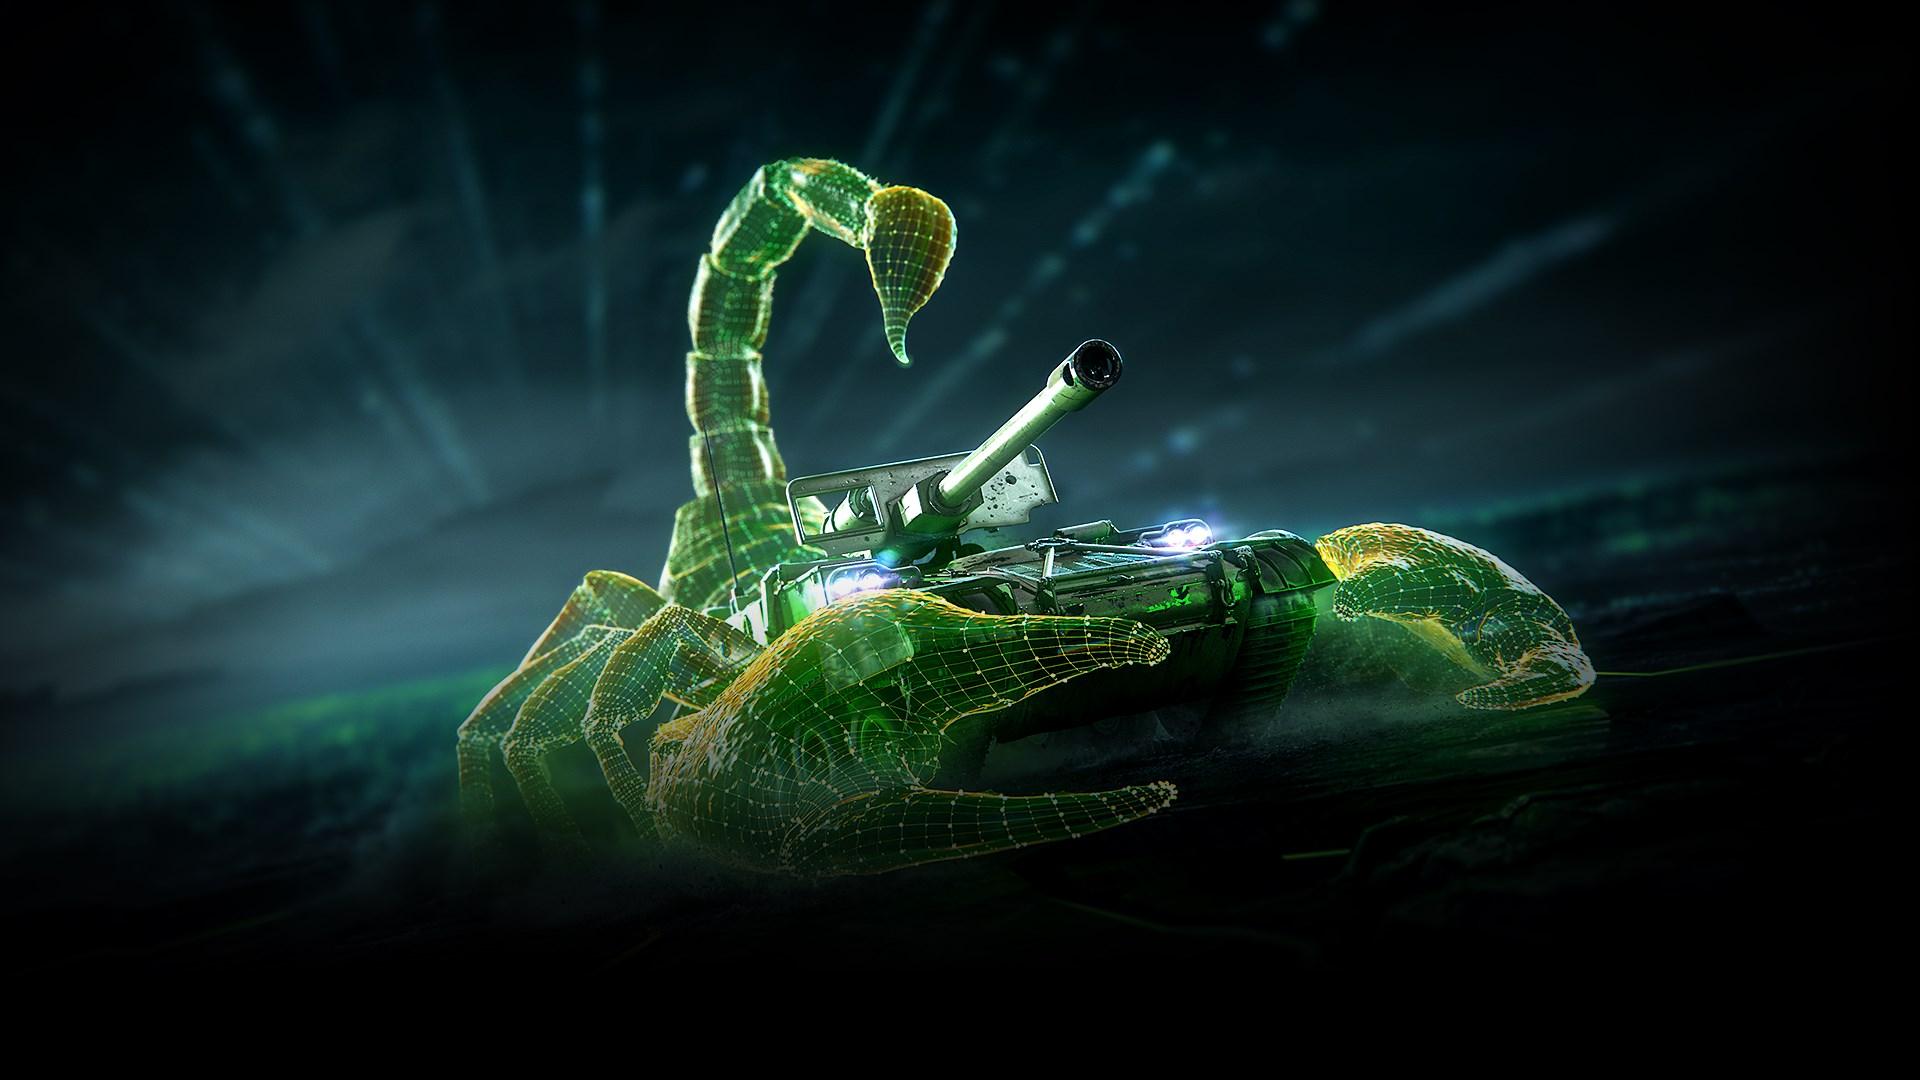 Xbox Scorpion Bundle